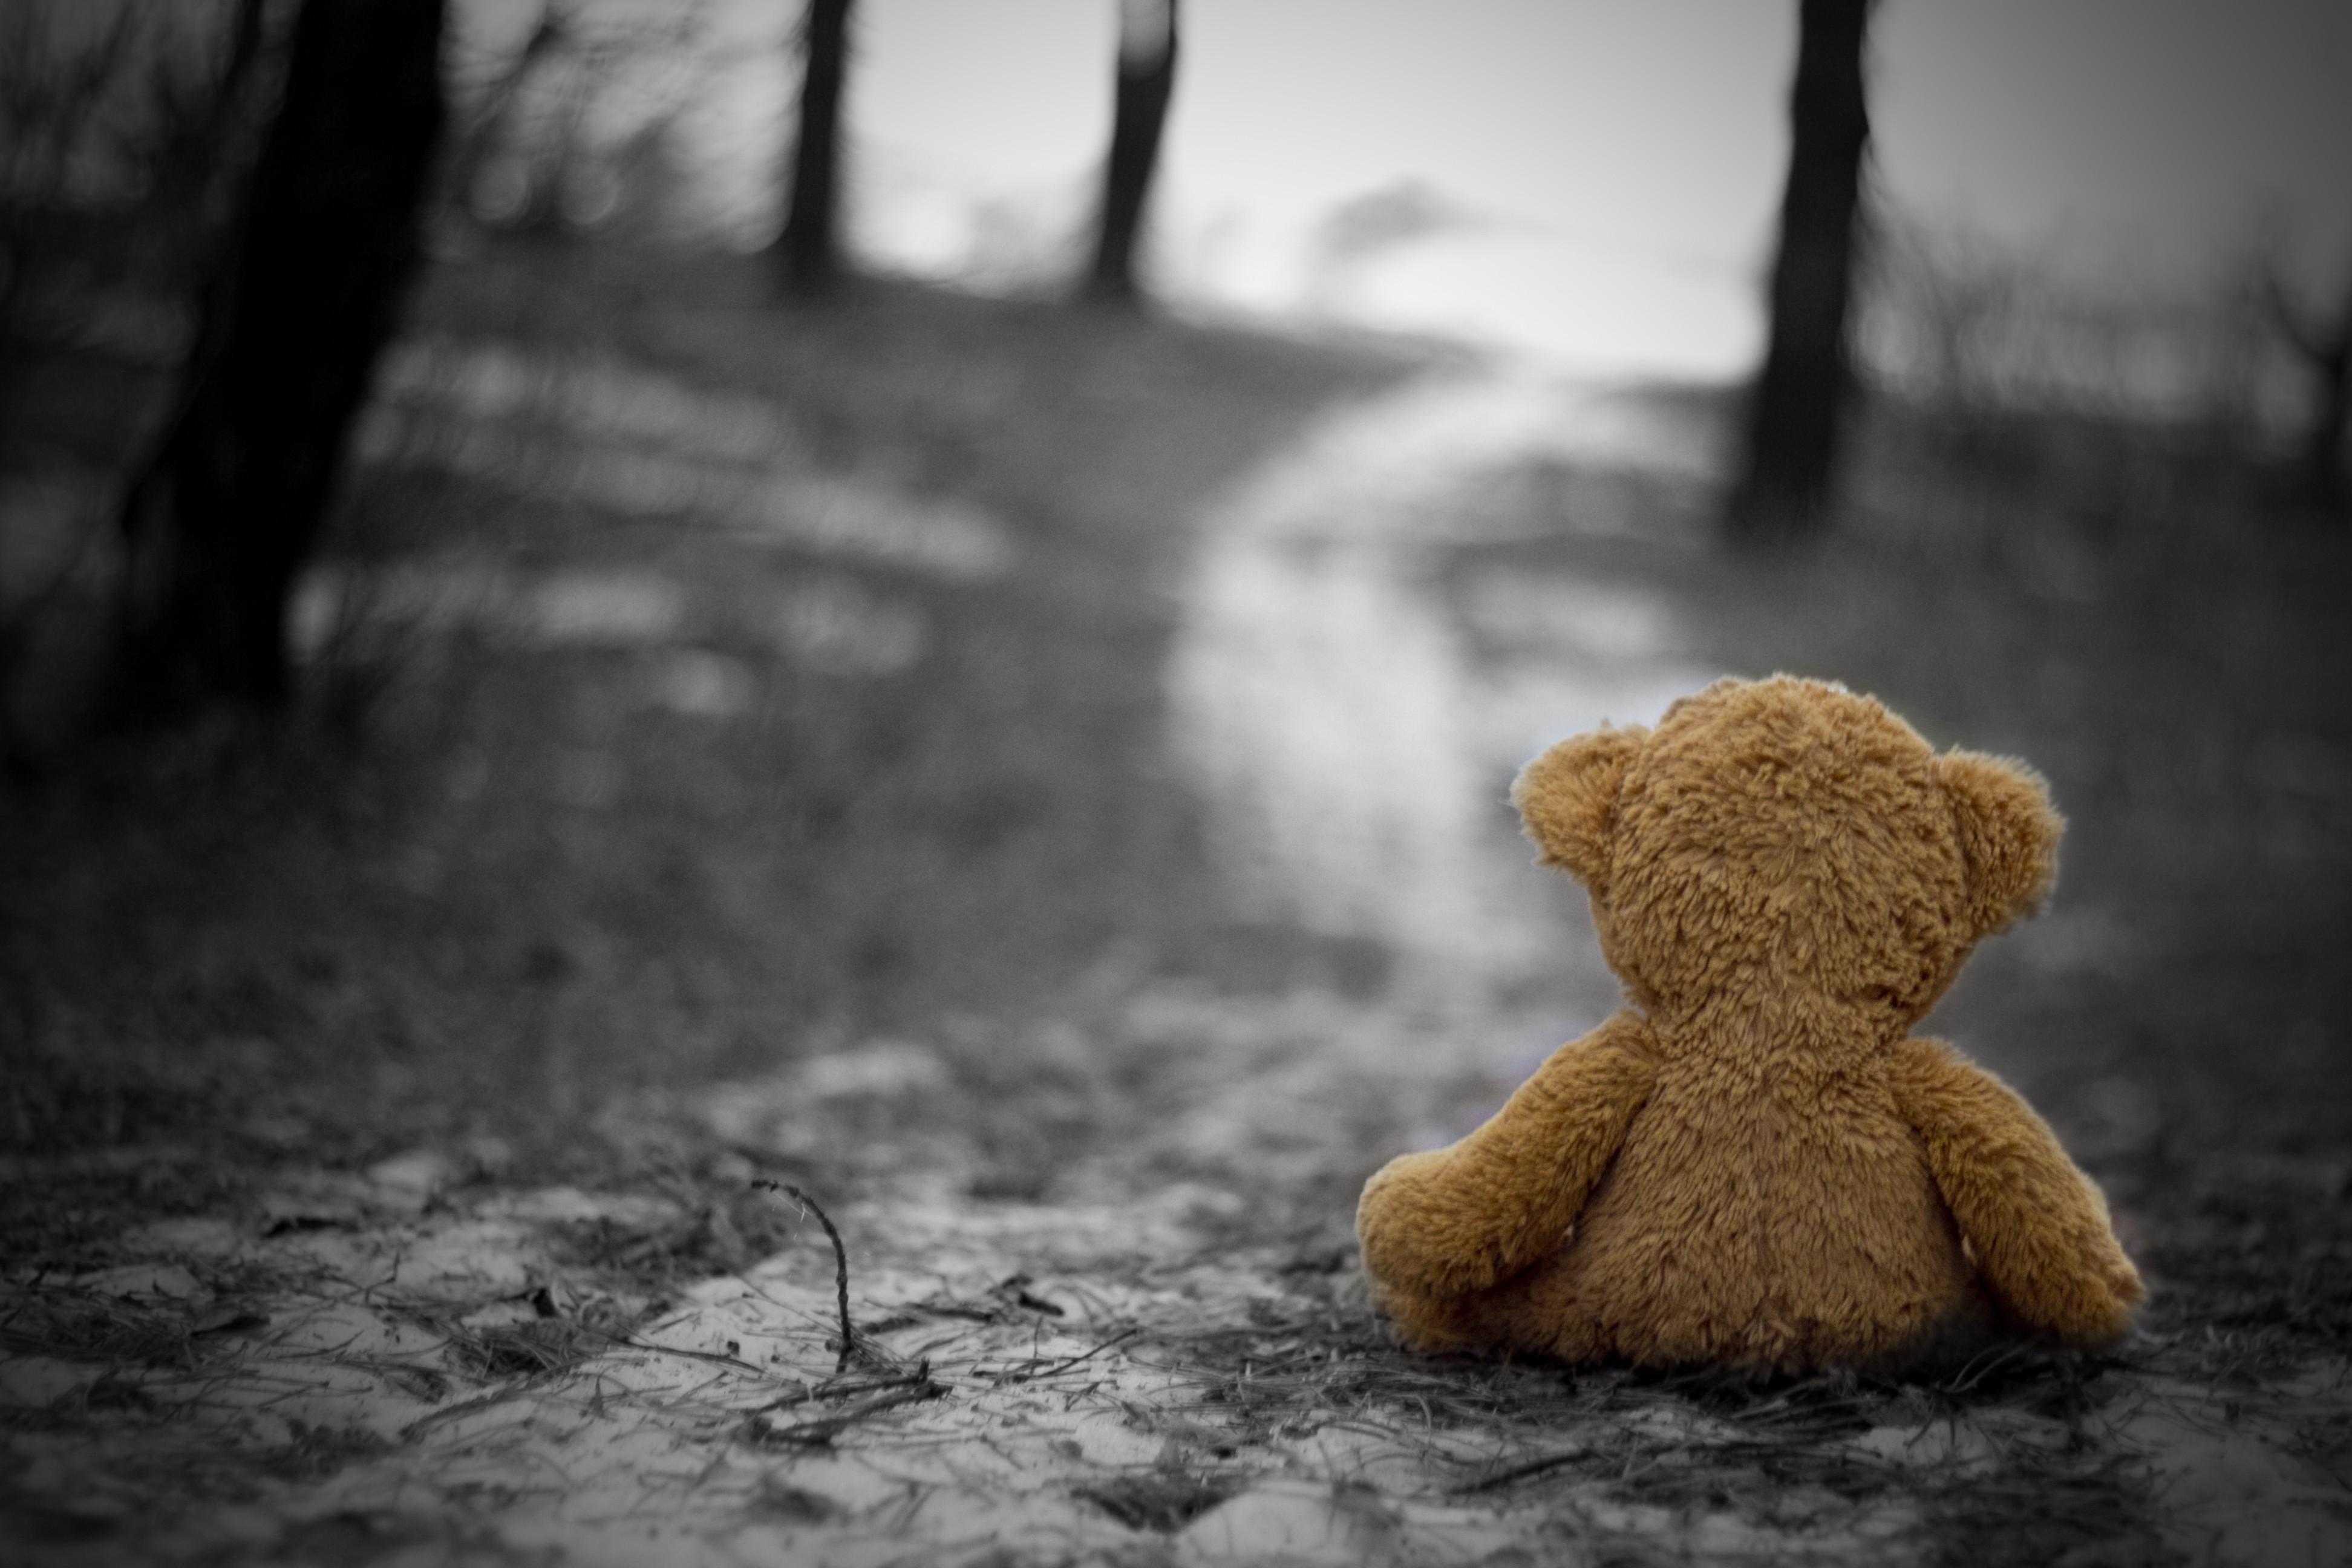 autumn cold toys lonely nostalgia sadness grief 3888x2592